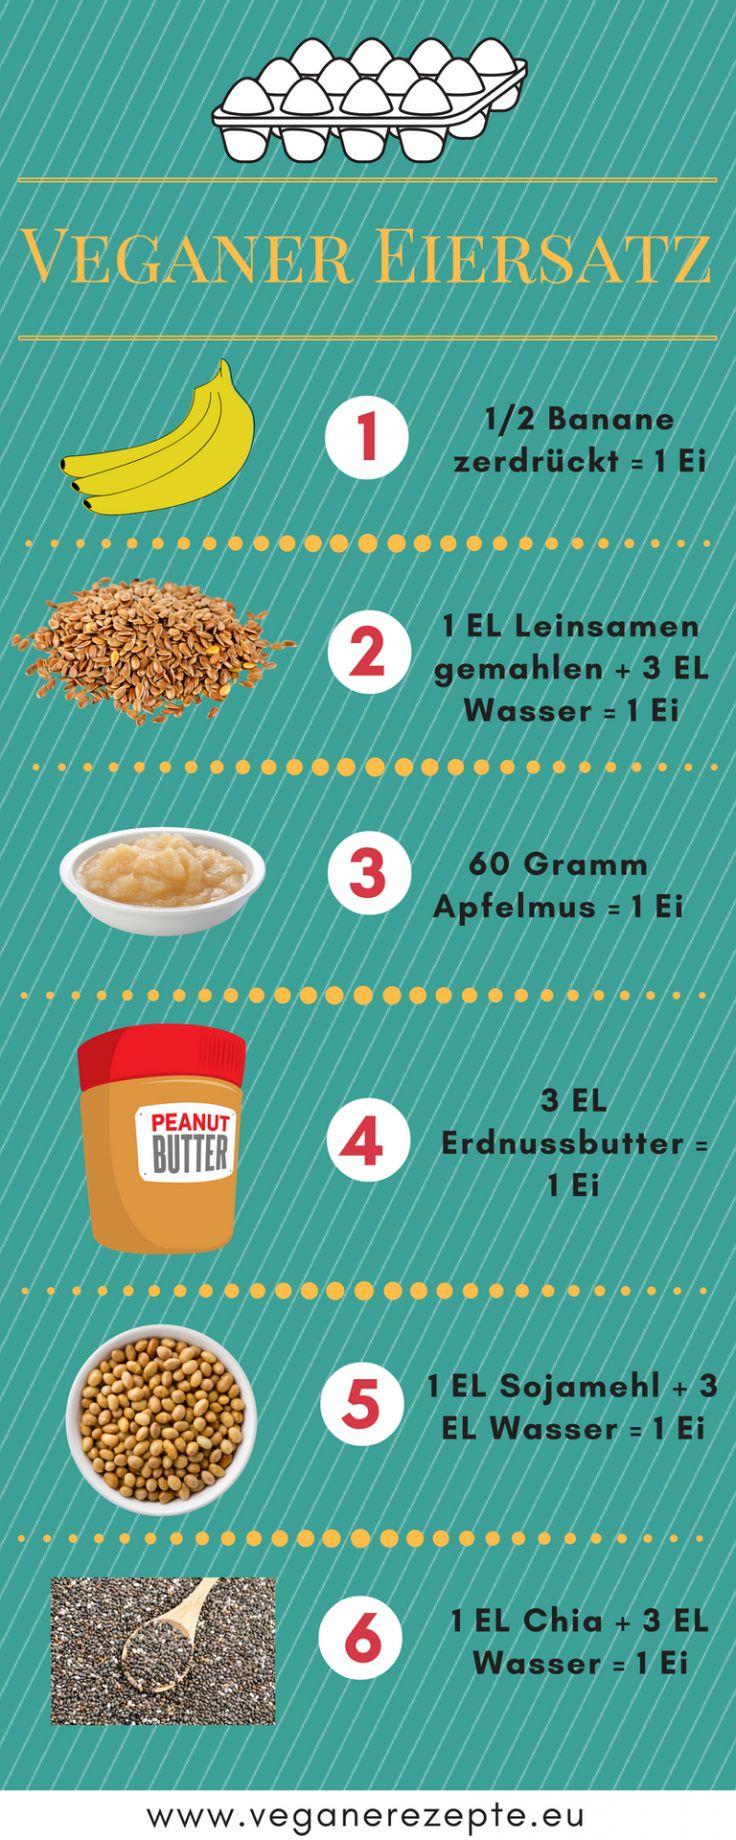 Veganer Ei-Ersatz #diat